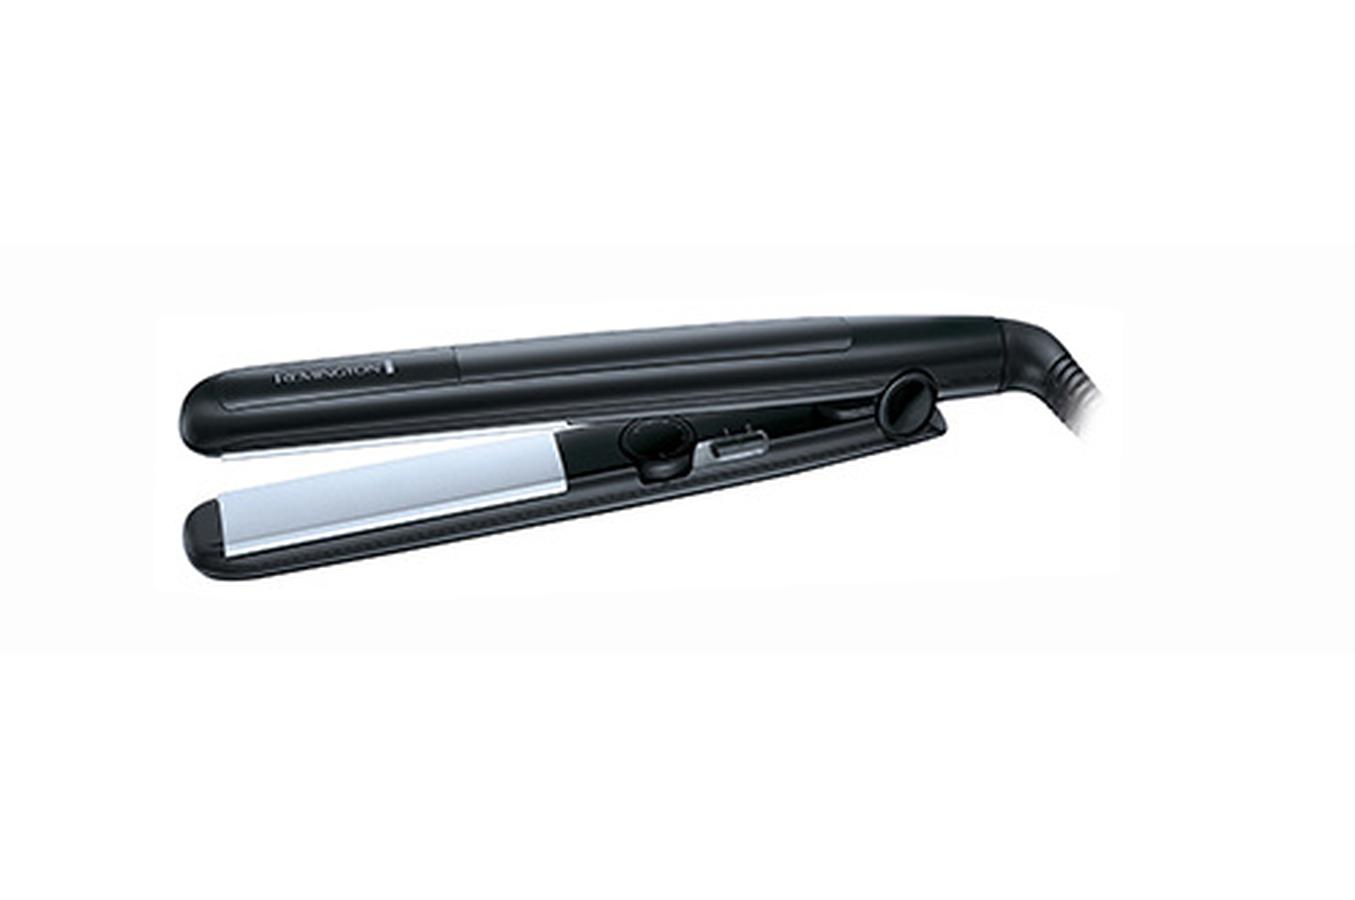 lisseur remington s3502ds 3803635 darty. Black Bedroom Furniture Sets. Home Design Ideas